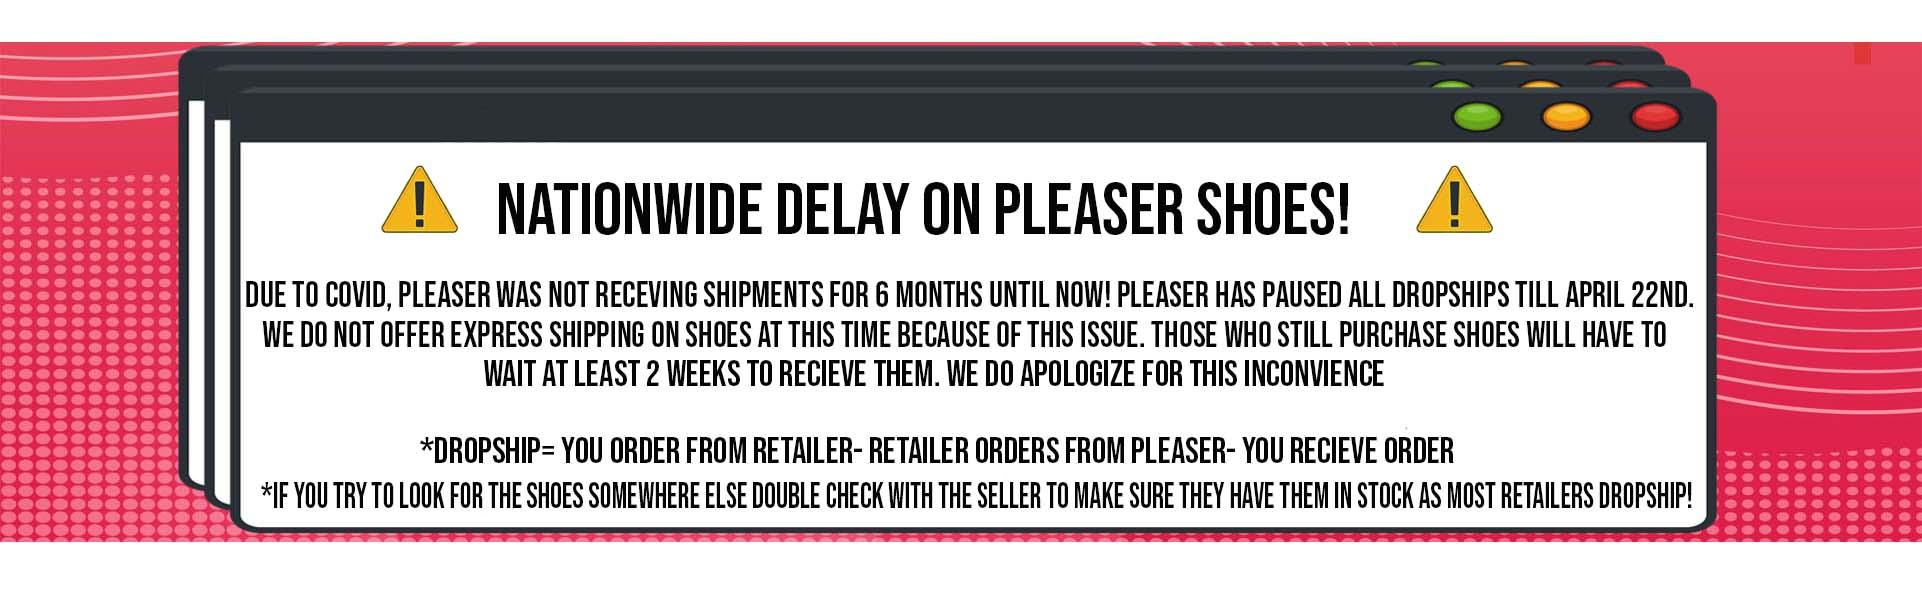 pleaser delay info mystrippercloset.com